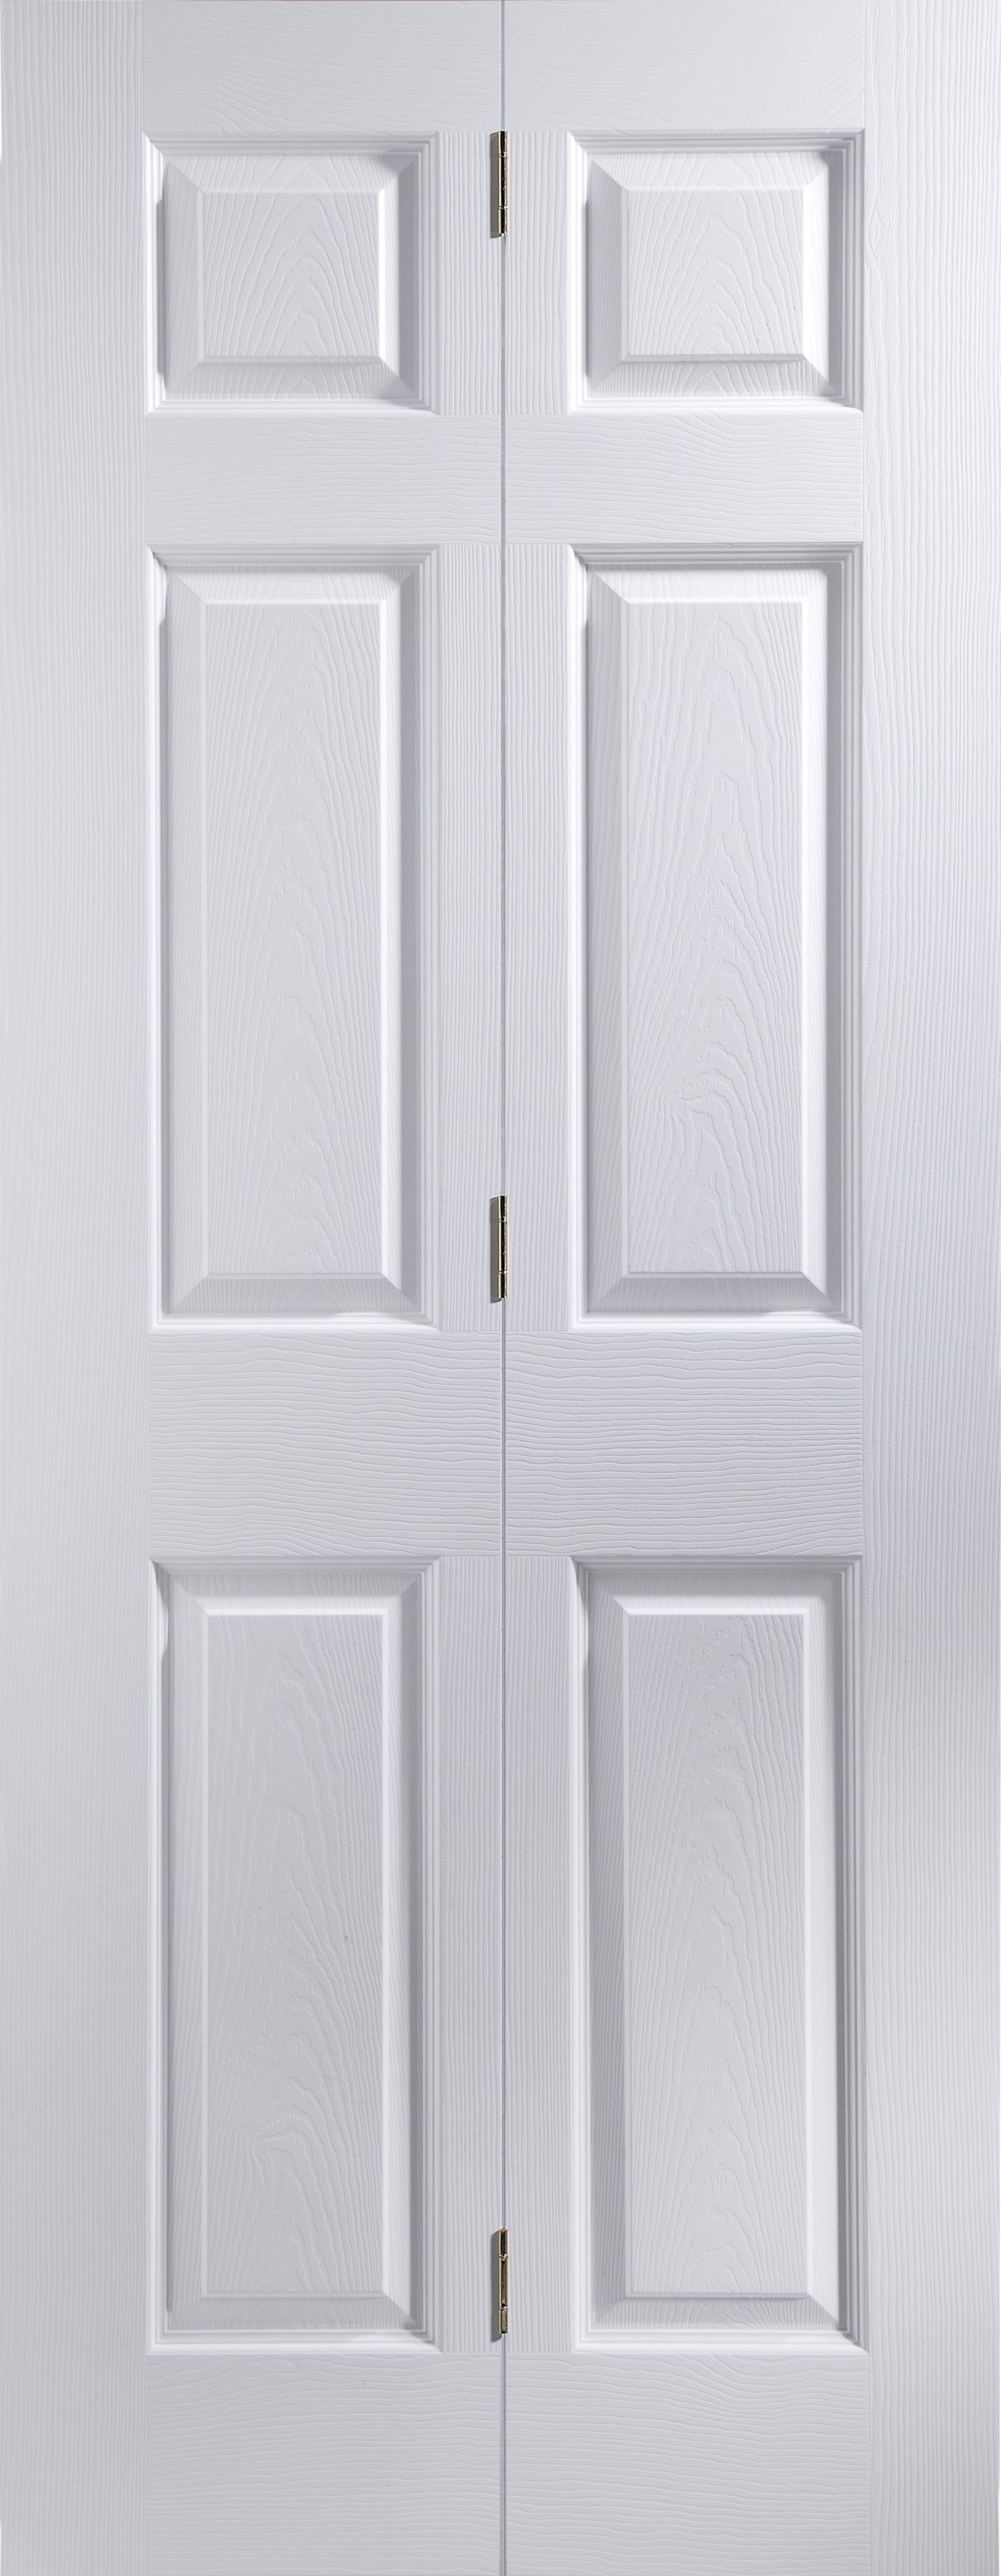 6 Panel Primed Woodgrain Effect Unglazed Internal Bi-fold Door, (h)1950mm (w)595mm